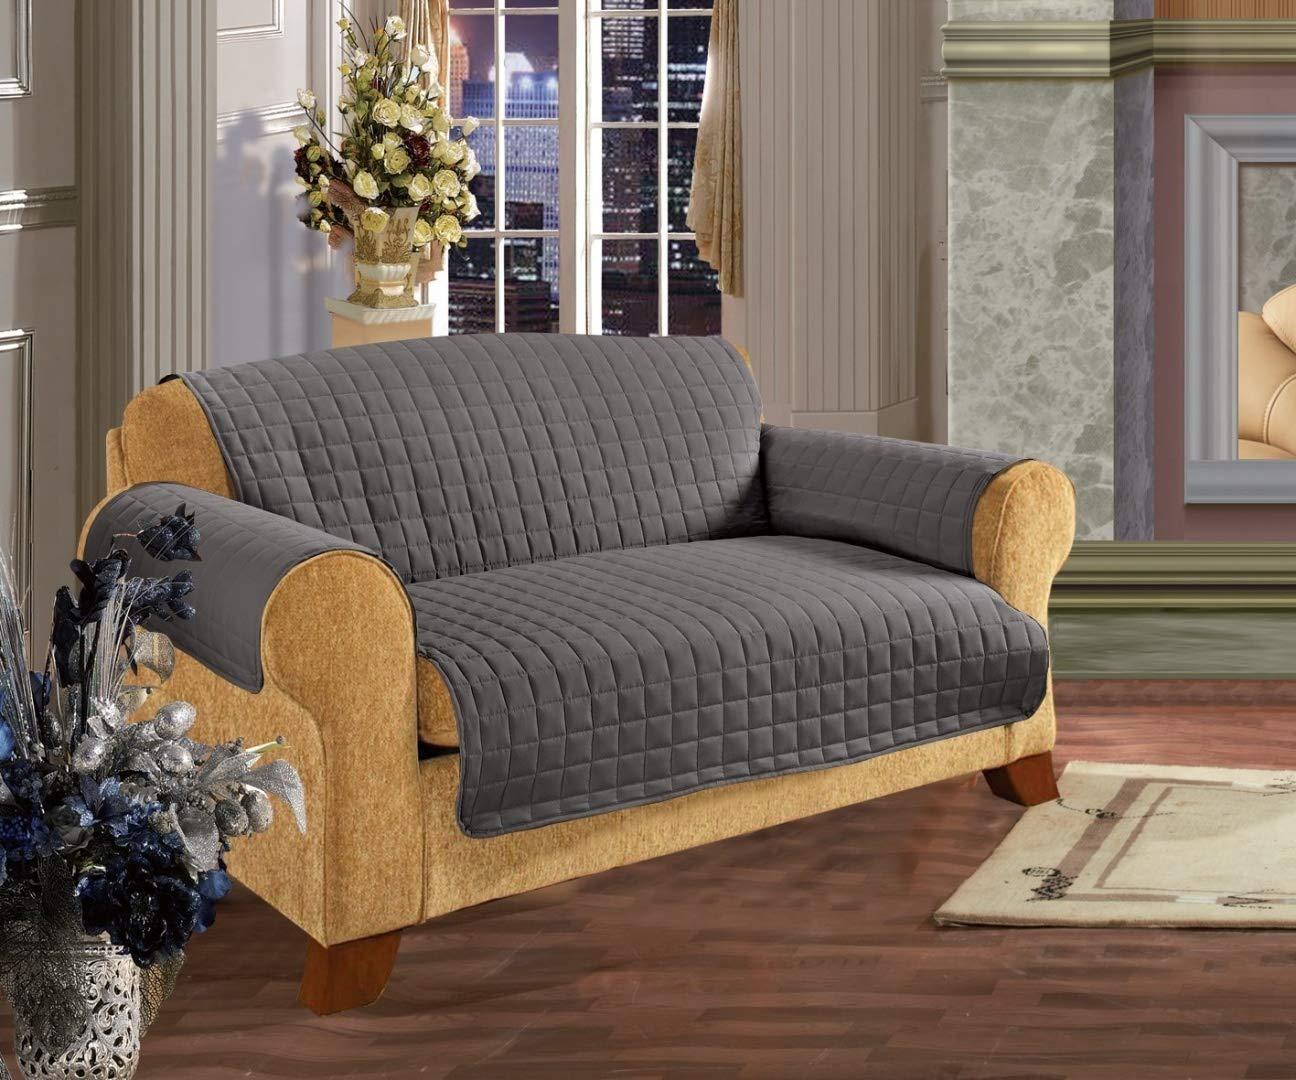 Elegance Linen Quilted Pet Dog Children Kids Furniture Protector Microfiber Slip Cover Sofa, Gray